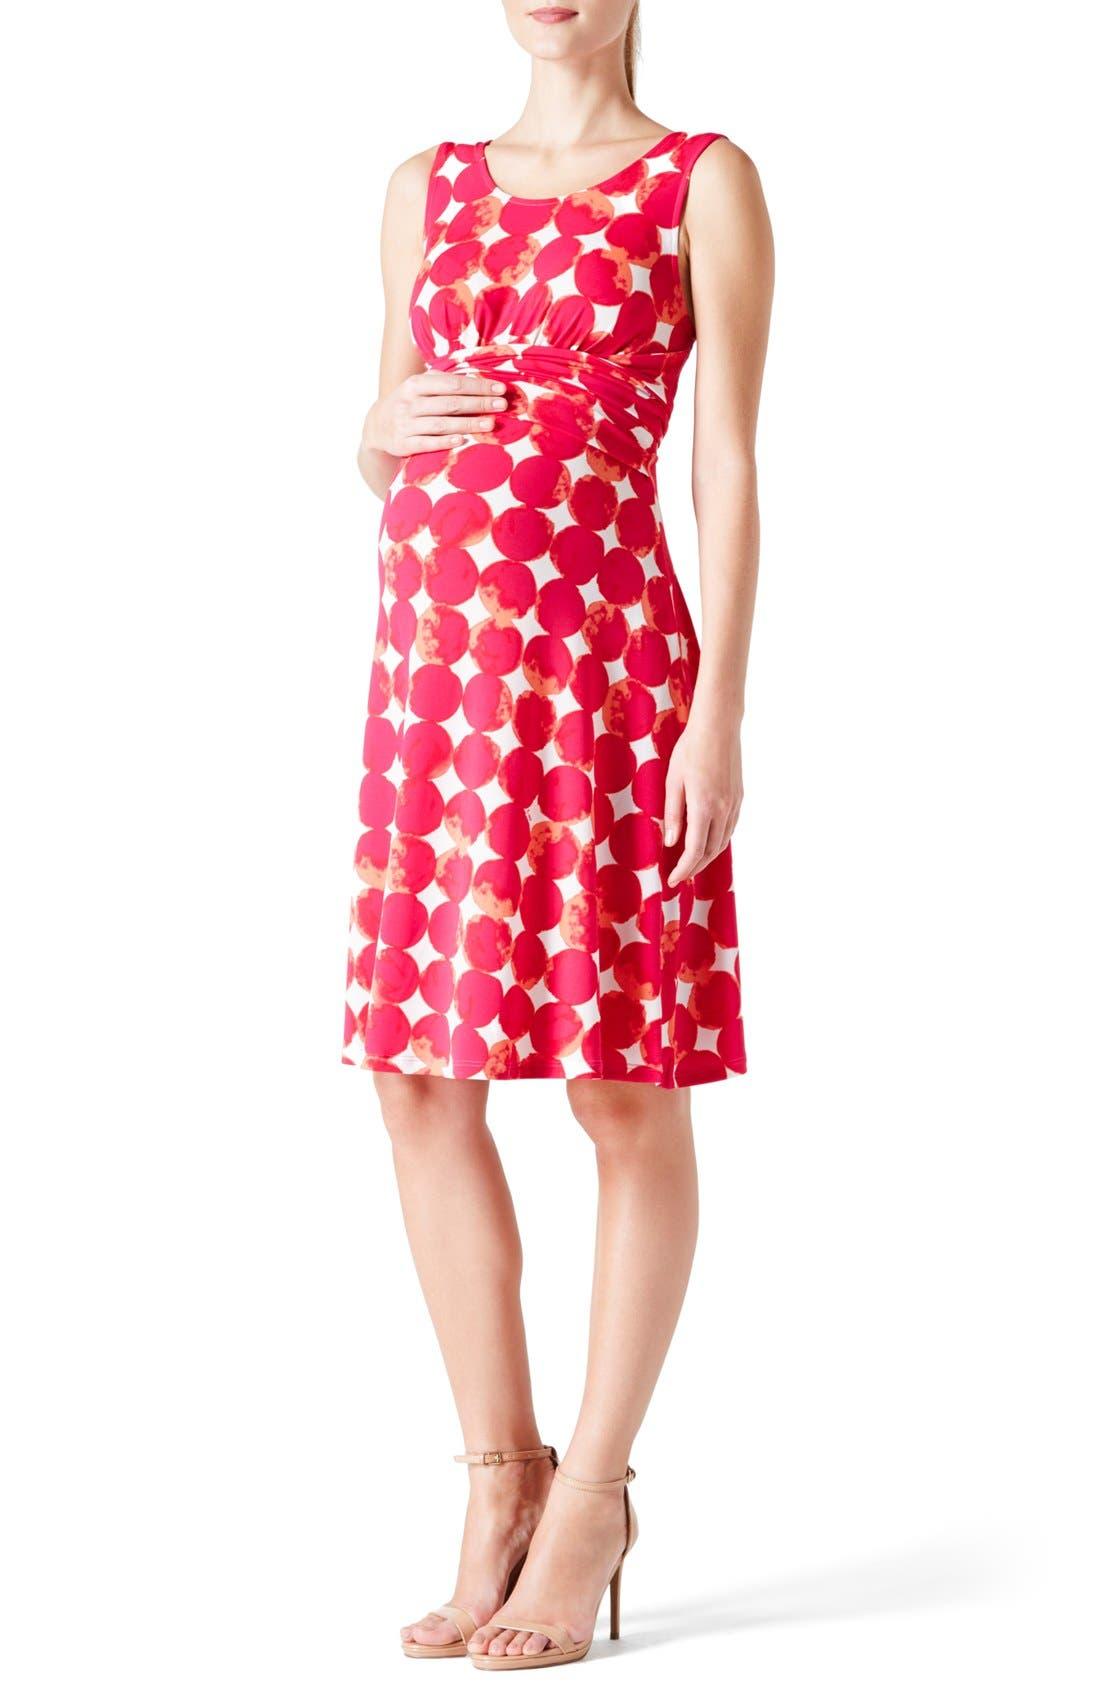 Leota 'Brittany' Sleeveless A-Line Maternity Dress